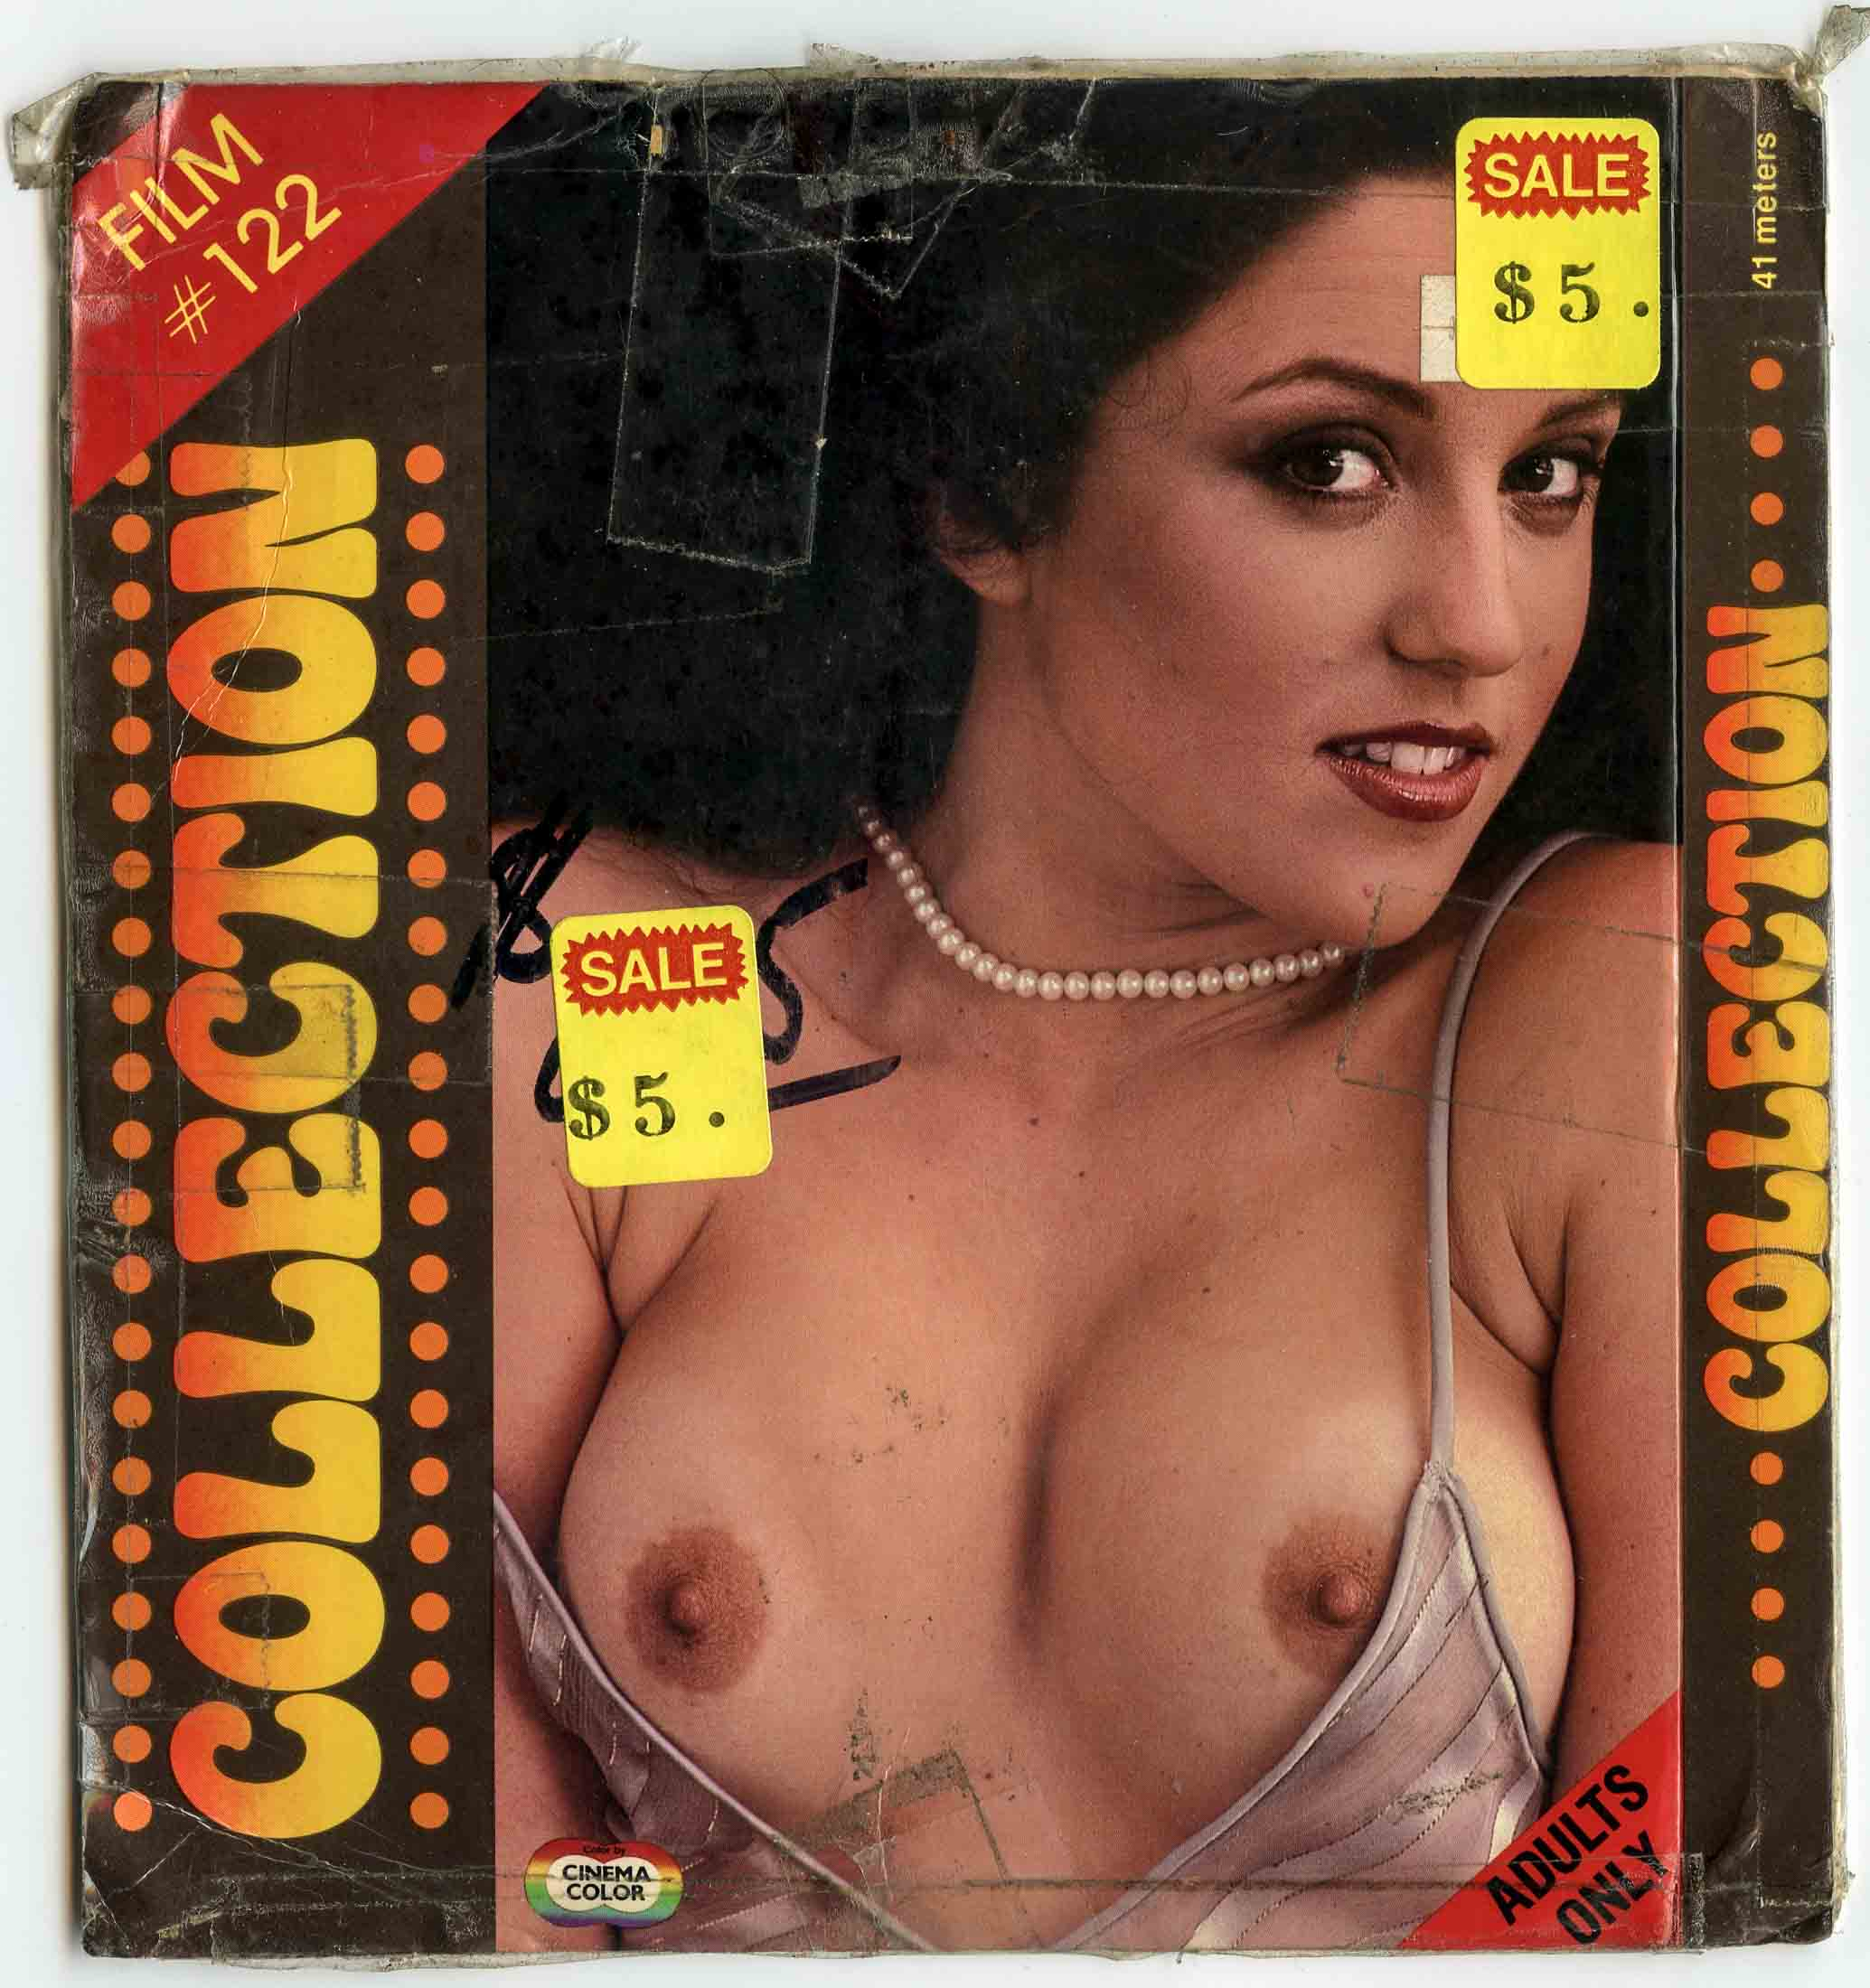 1940s Color Porn - 1940s vintage enemas porn - Selections from artists book daniel teoli  archival jpg 723x769